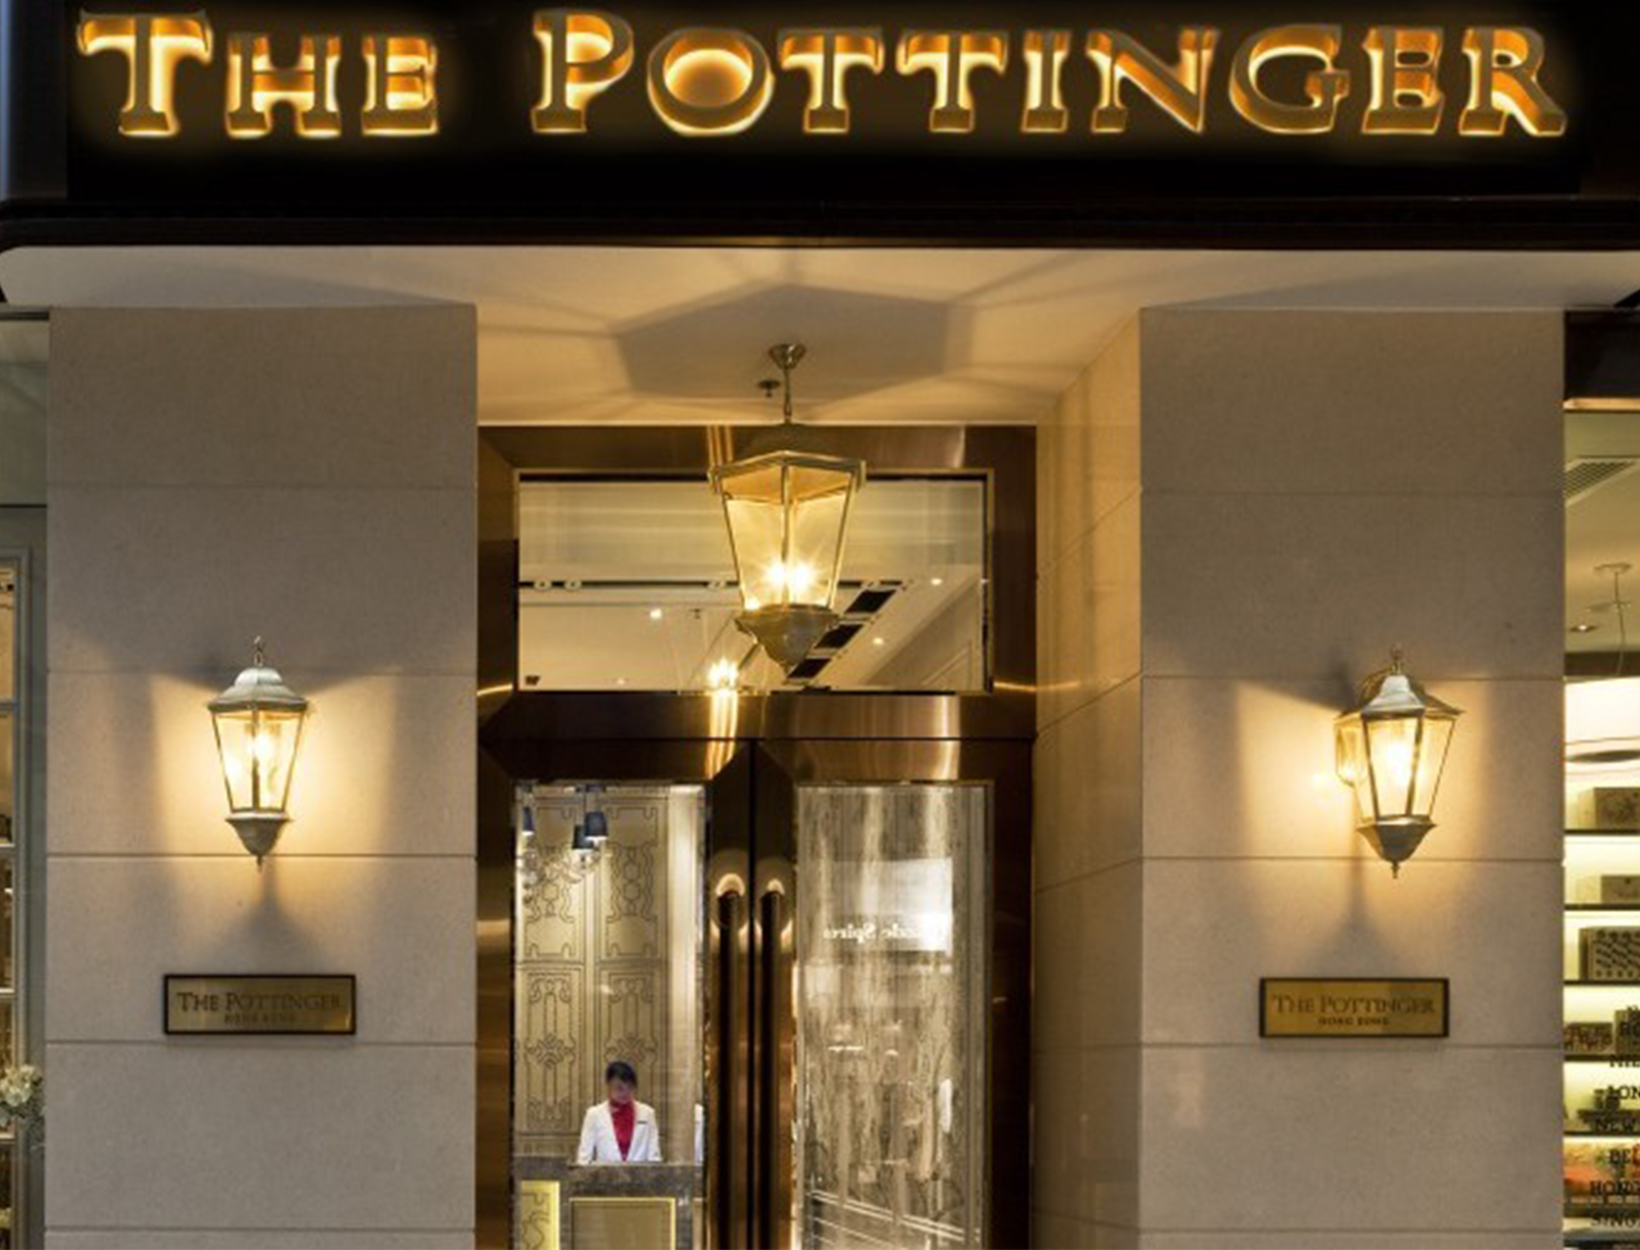 The Pottinger